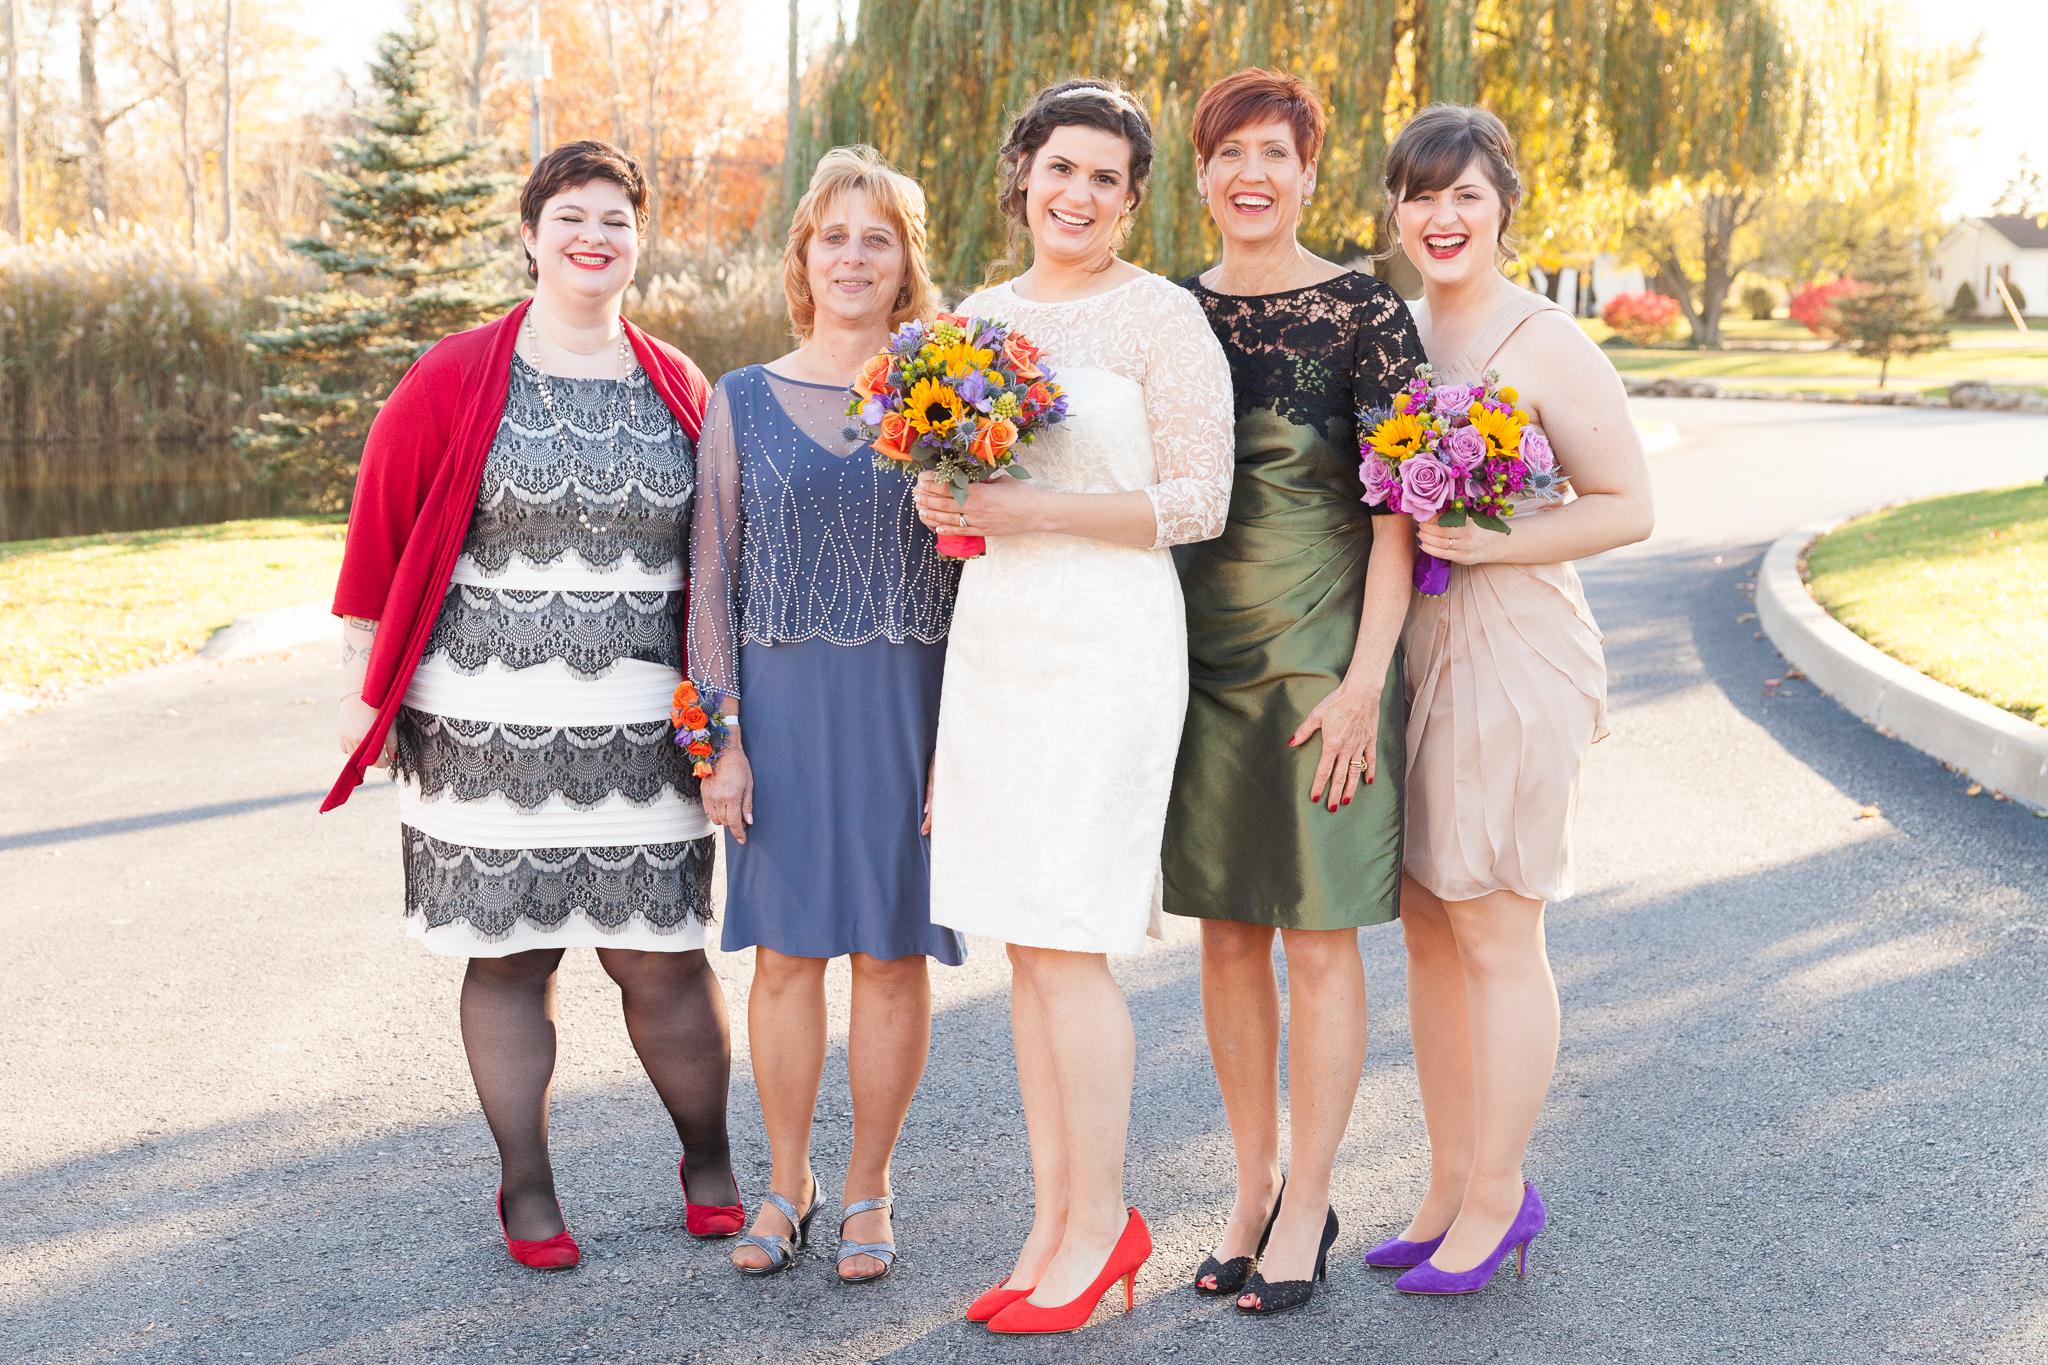 camuglia-whomstudio-chelsea_and_andy-nycphotographer-wedding-brooklyn-buffalo-timberlodge-034-0192.jpg